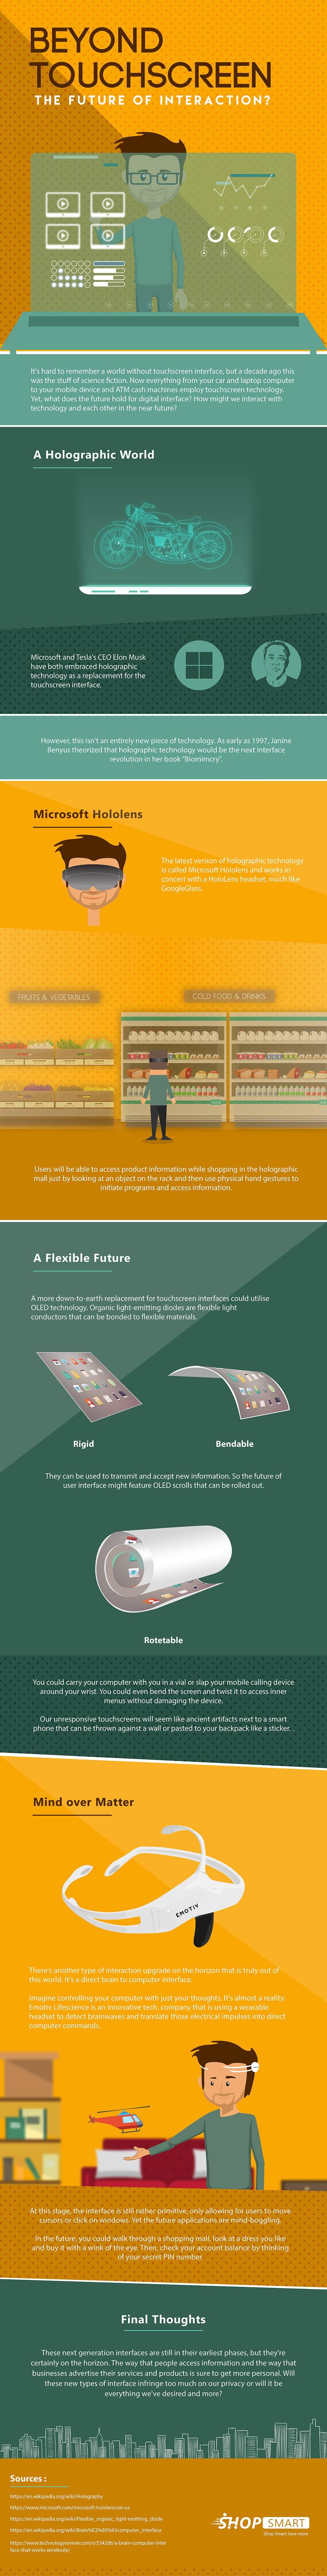 beyond-touchscreens-future-interaction-infographic-tech-gadgets-electronics-design